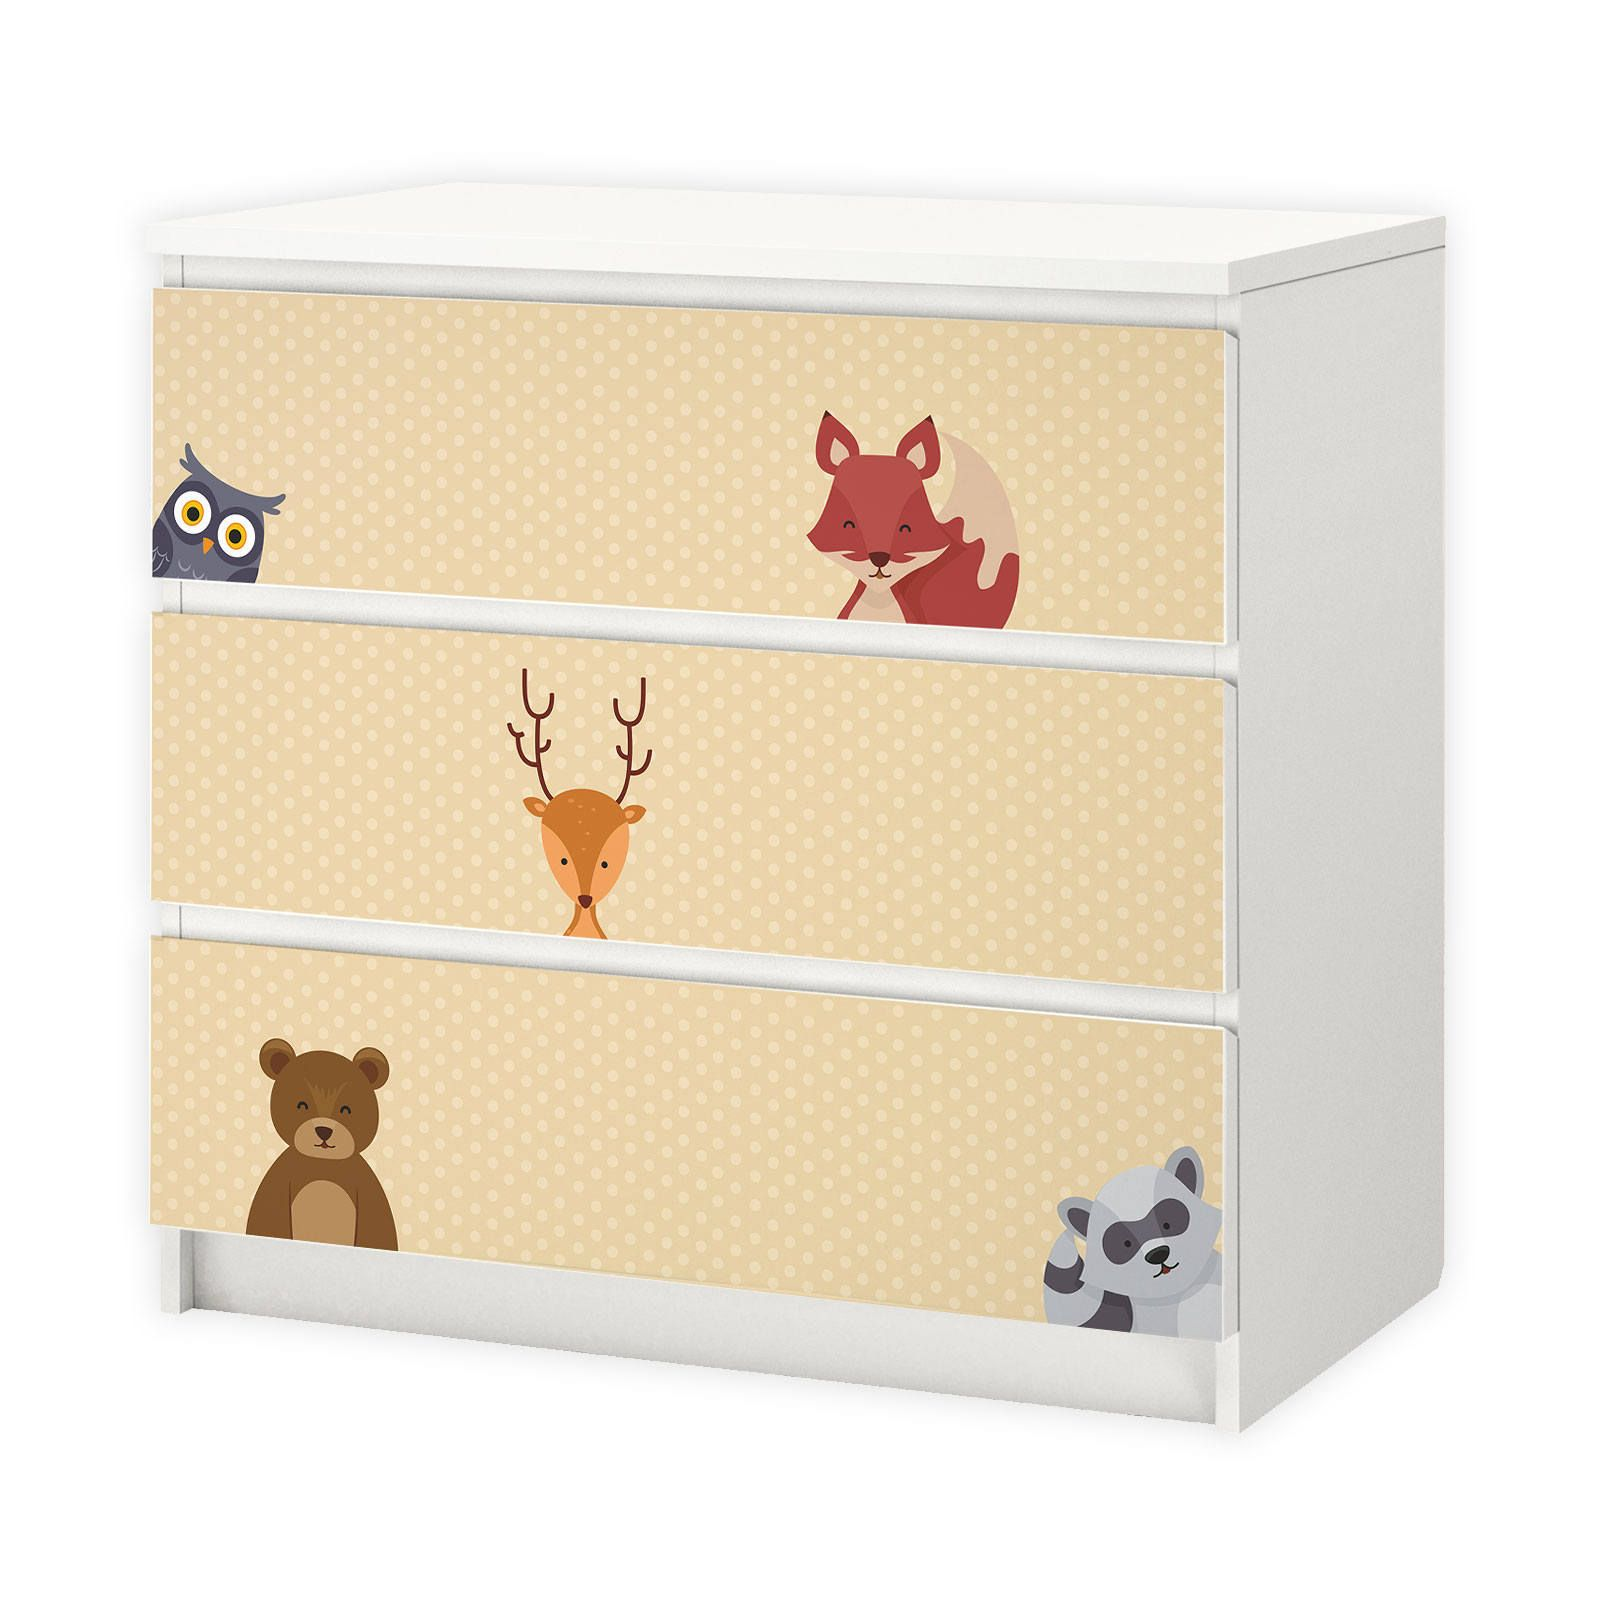 Mobelfolie Folie Kinderzimmer Malm Waldtiere Diy Doityourseslf Kinder Zimmer Ikea Malm Kinderzimmer